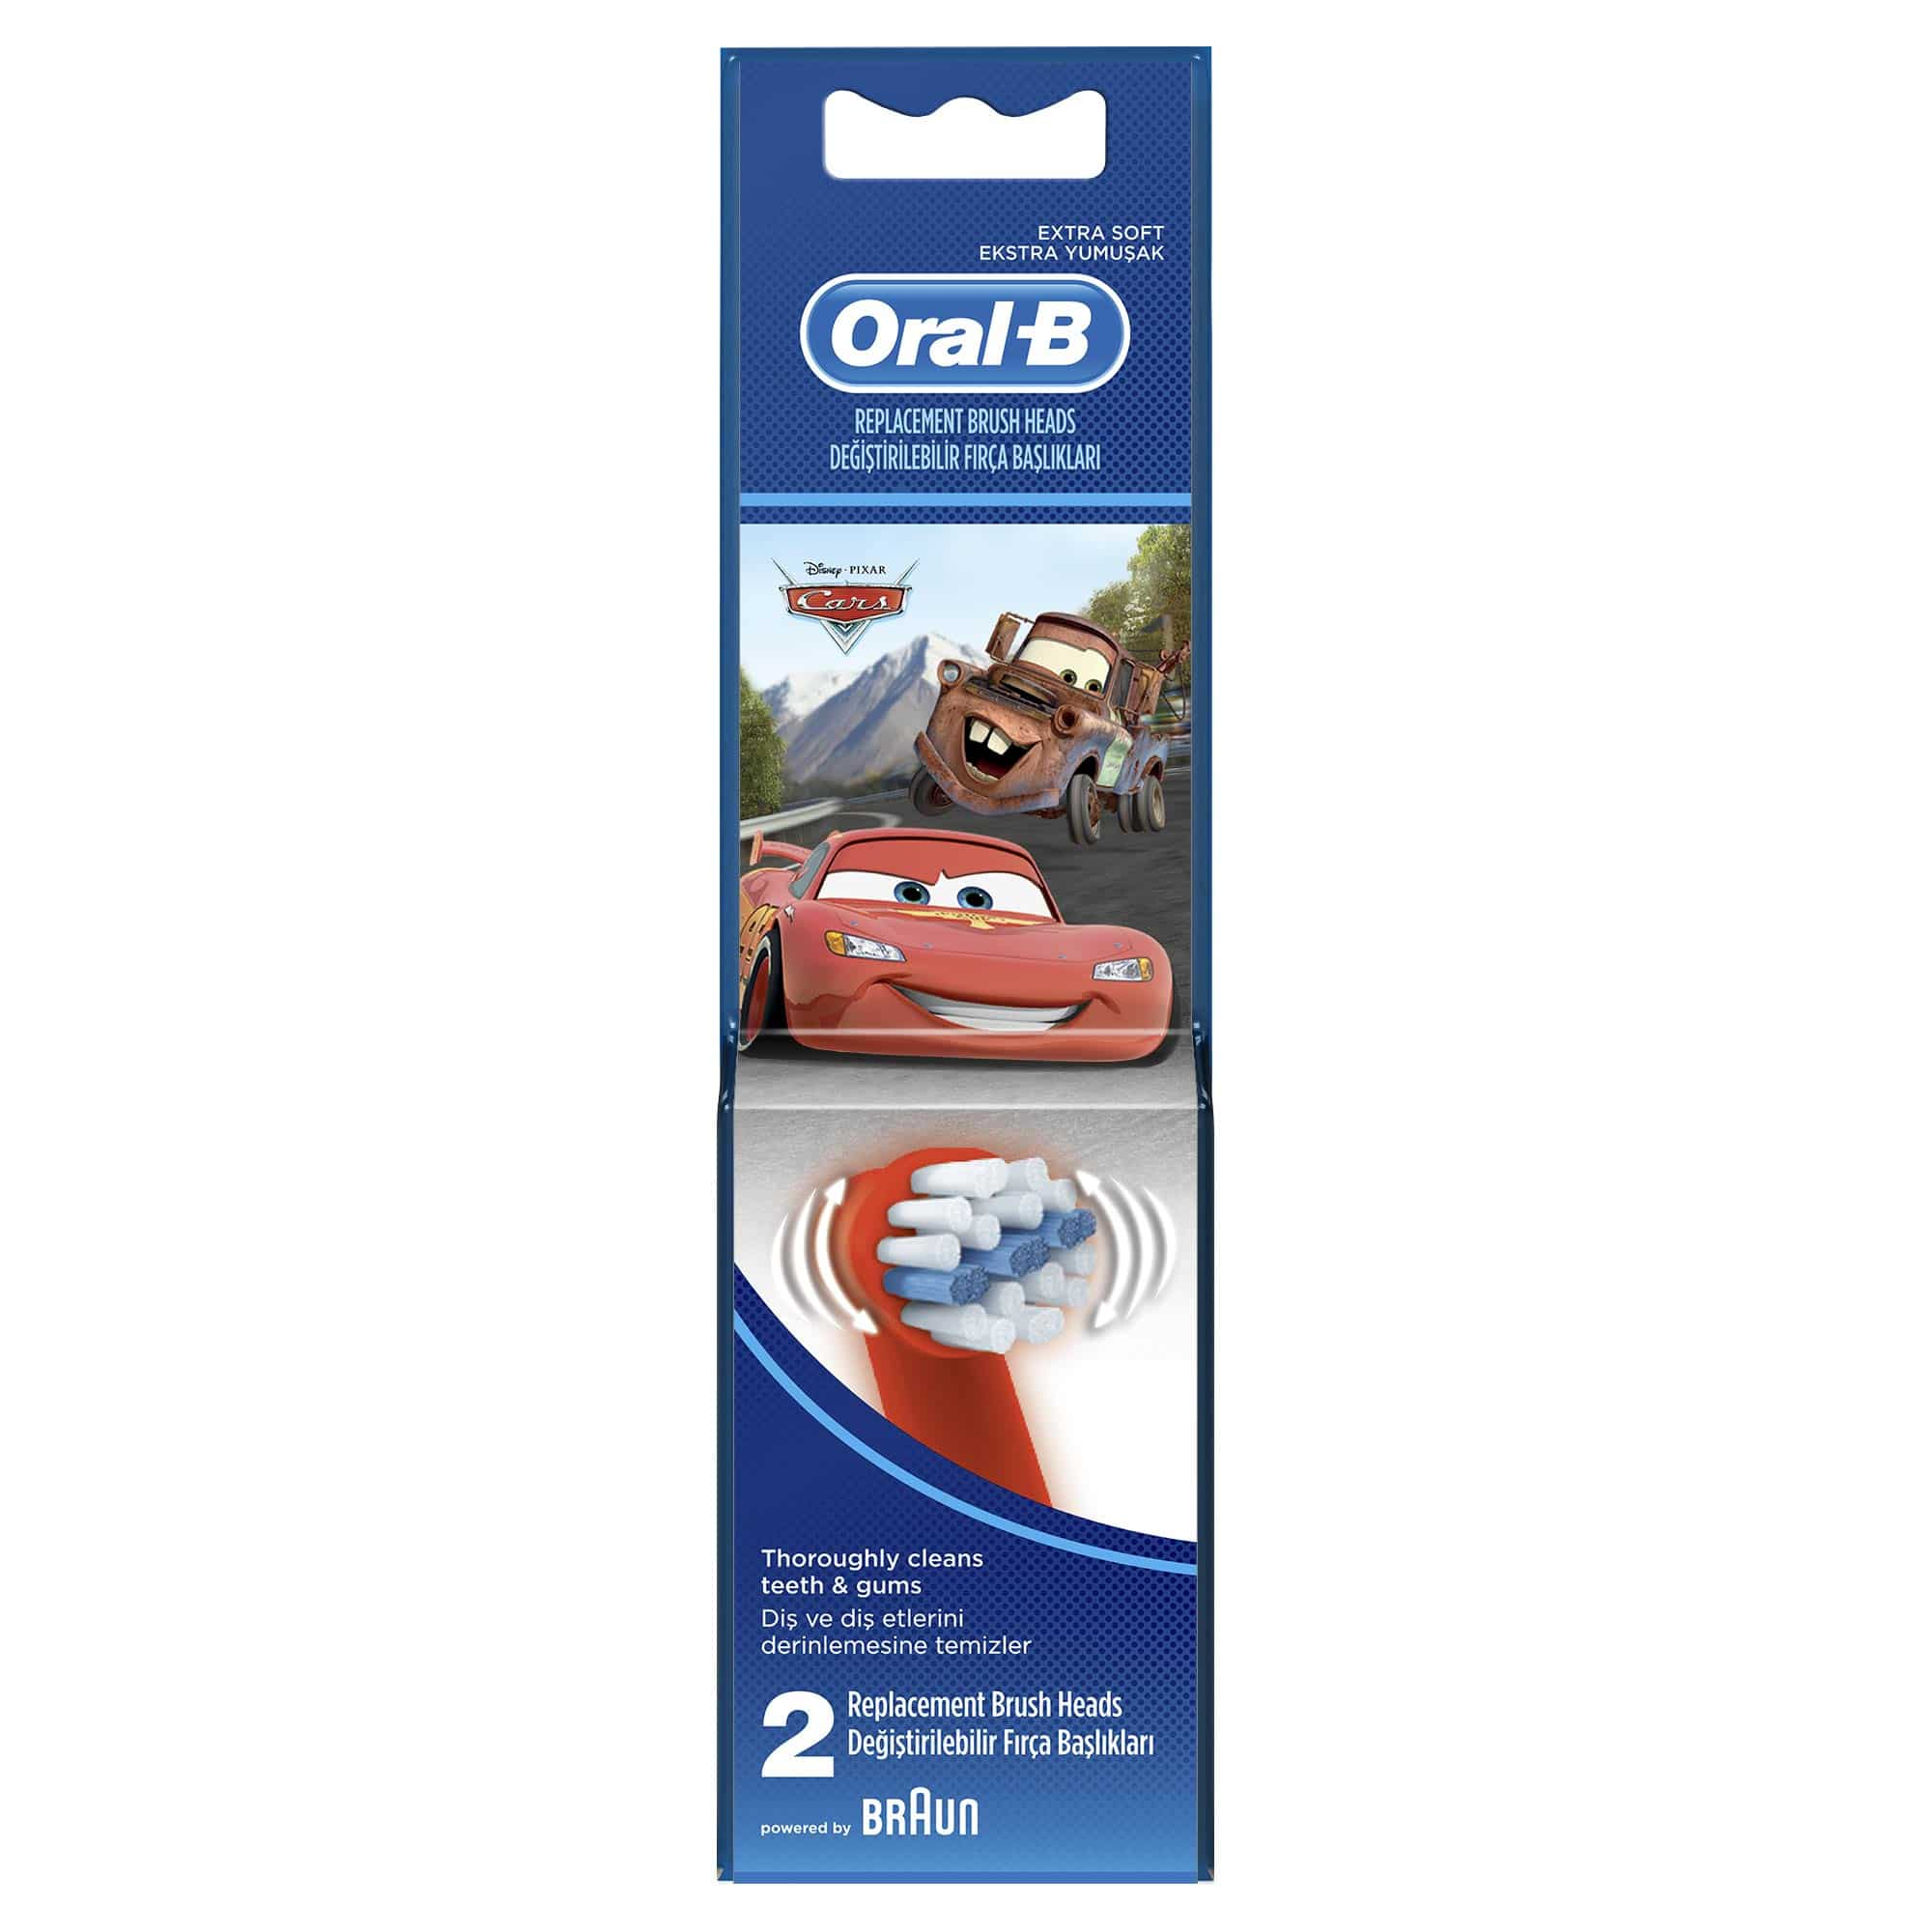 OralB Stages Power Kids Cars Ανταλλακτικά Παιδικής Ηλεκτρικής Οδοντόβουρτσας, 2 τεμάχια